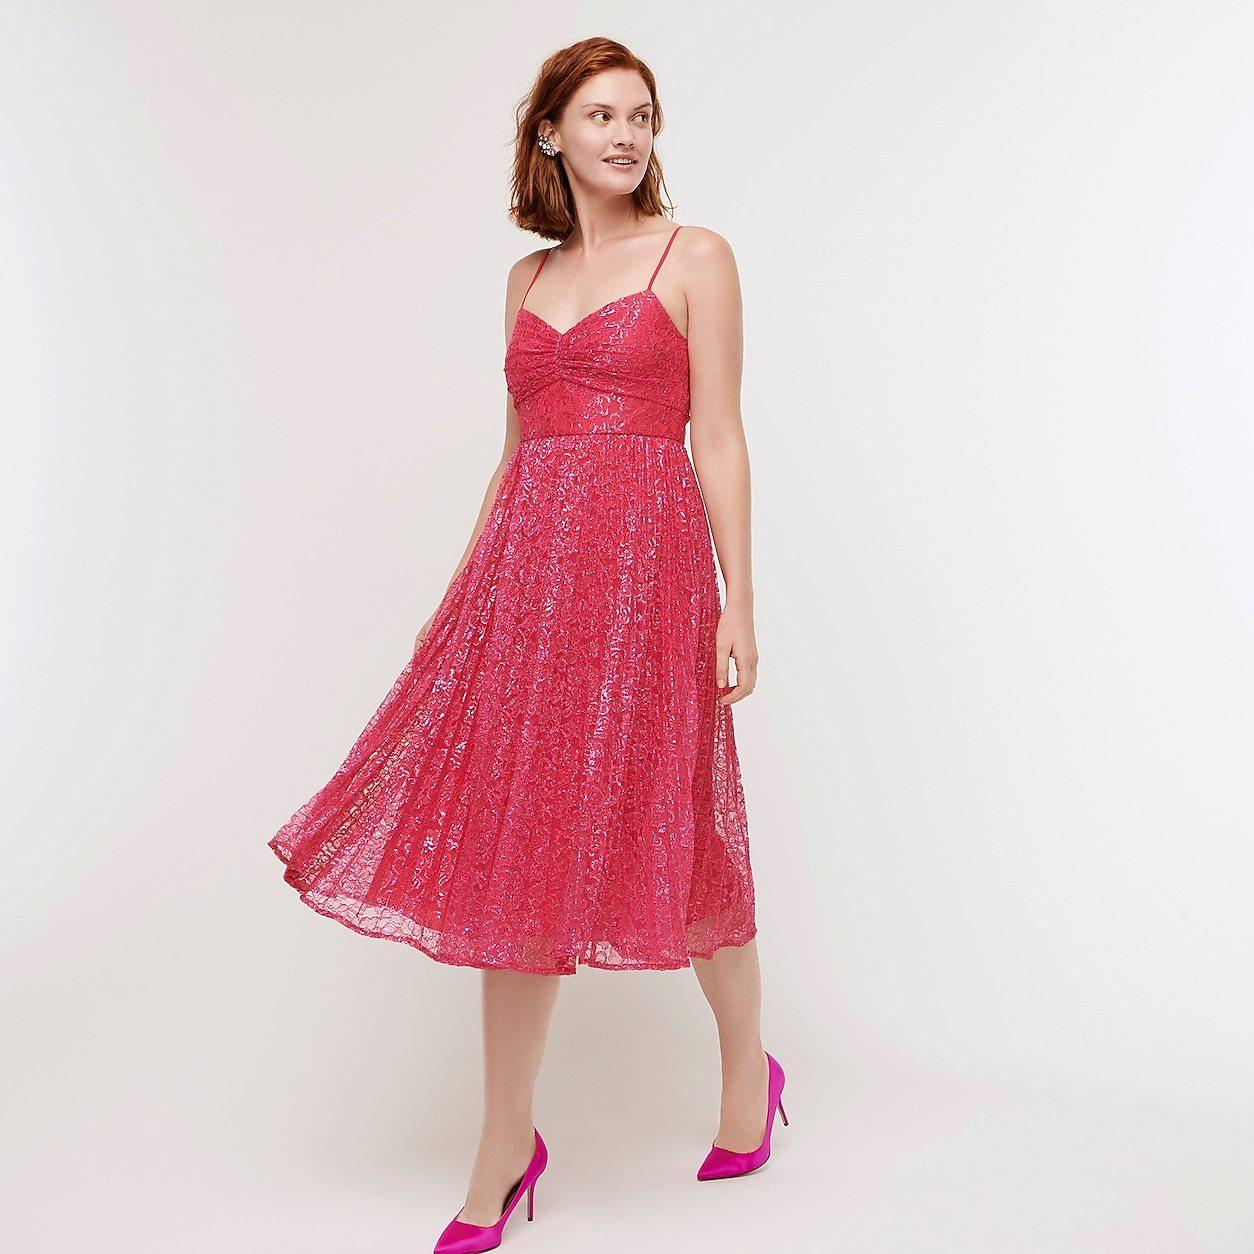 Pleated A-Line Midi Dress In Metallic Lace